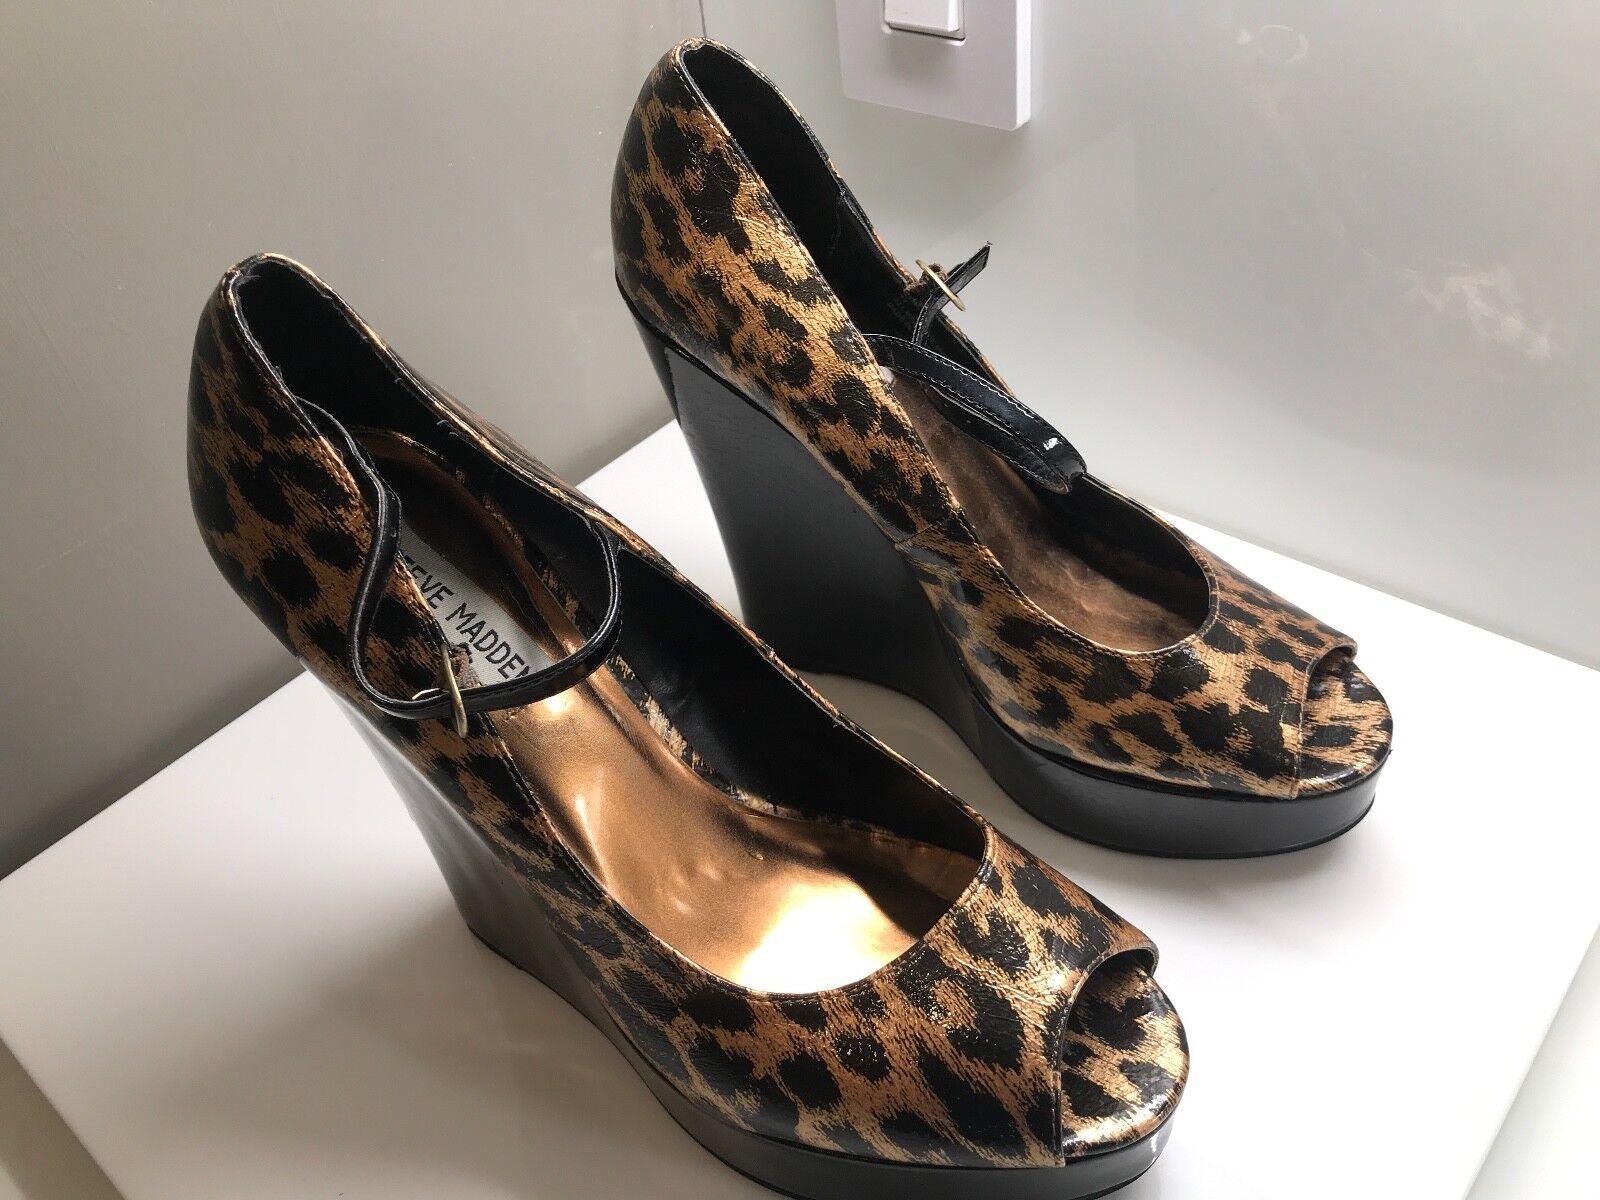 Steve Madden schuhe High Heels Wedges Größe 10 Trendy Designer schuhe Animal Print